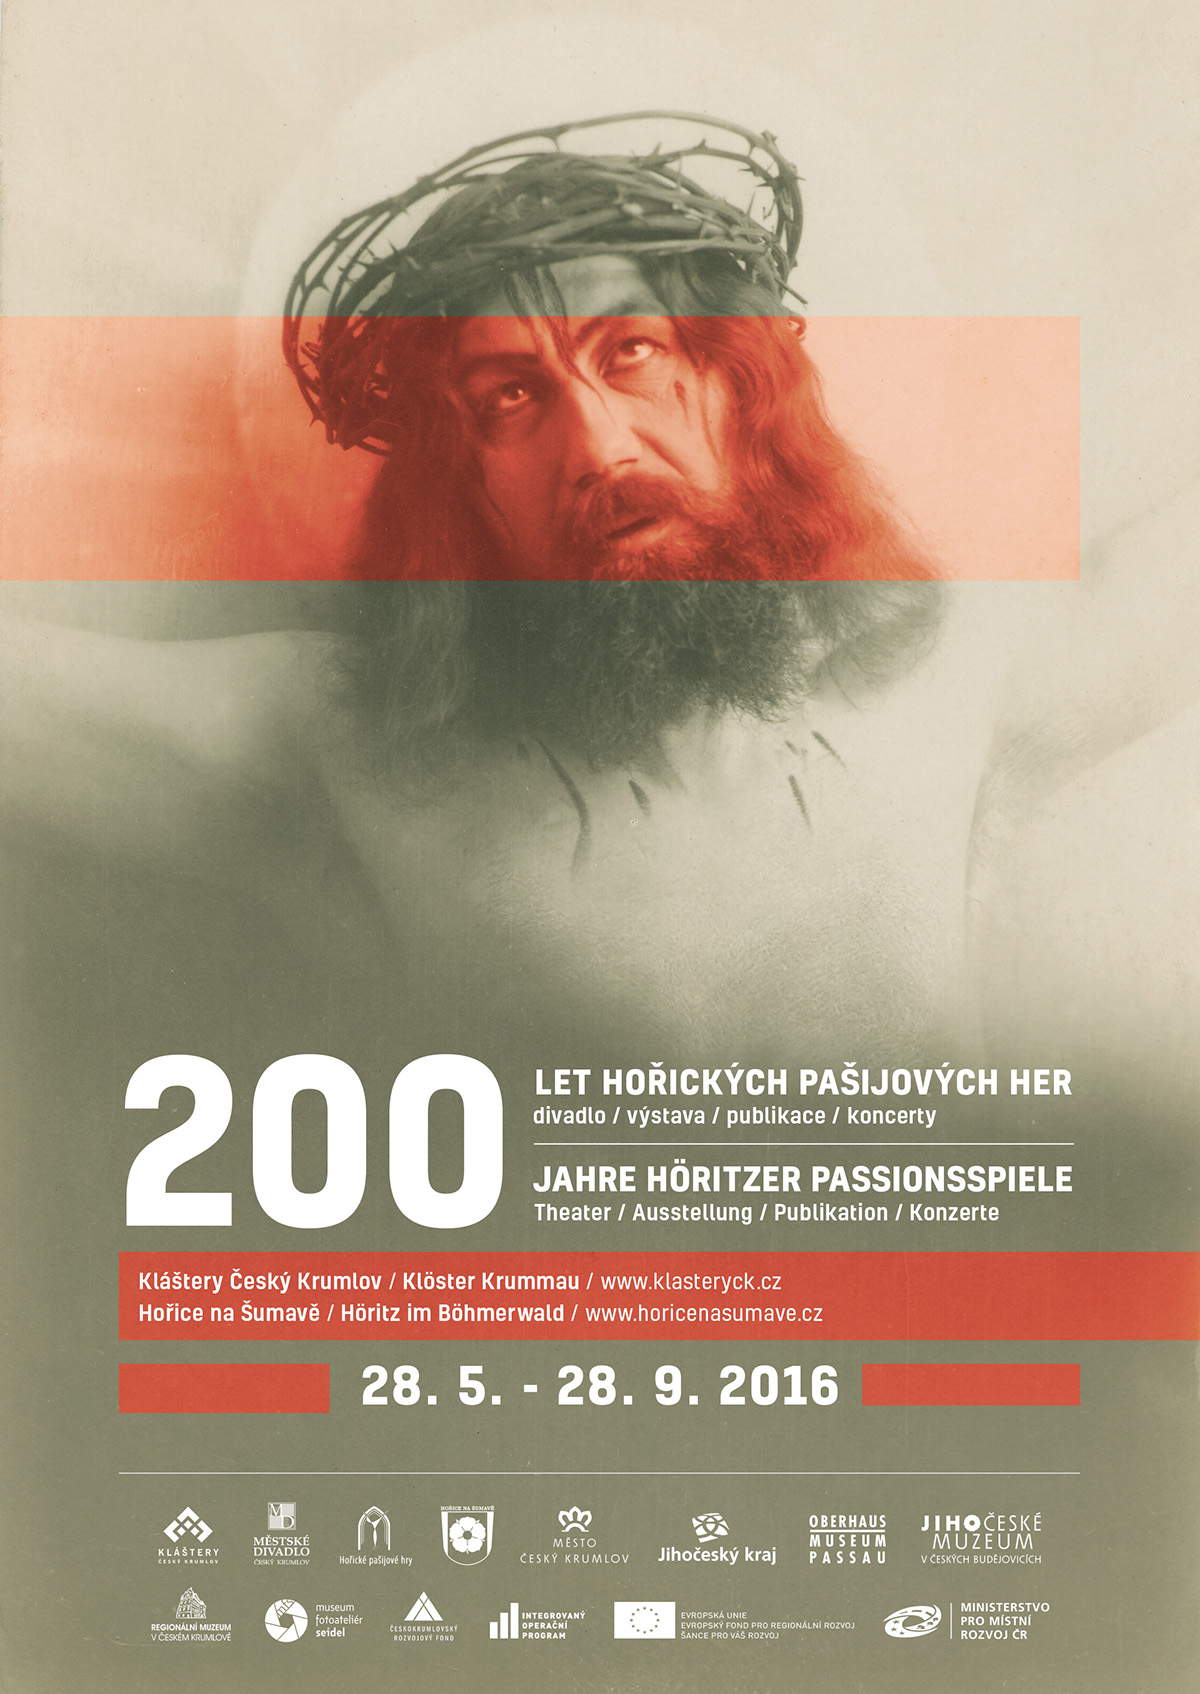 Passion Play theater  old photography red grey SOUTH BOHEMIA Hořice na Šumavě Exhibition  jesus